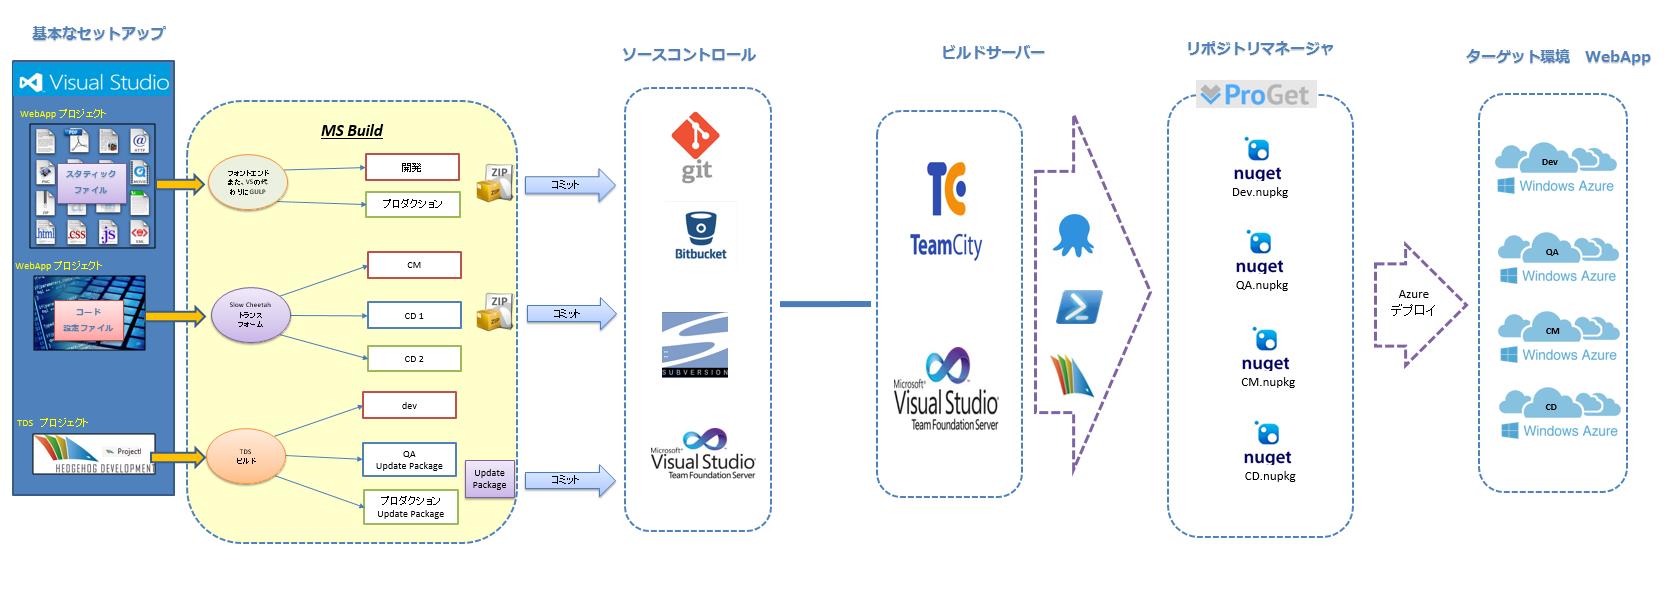 04_BuildServer2